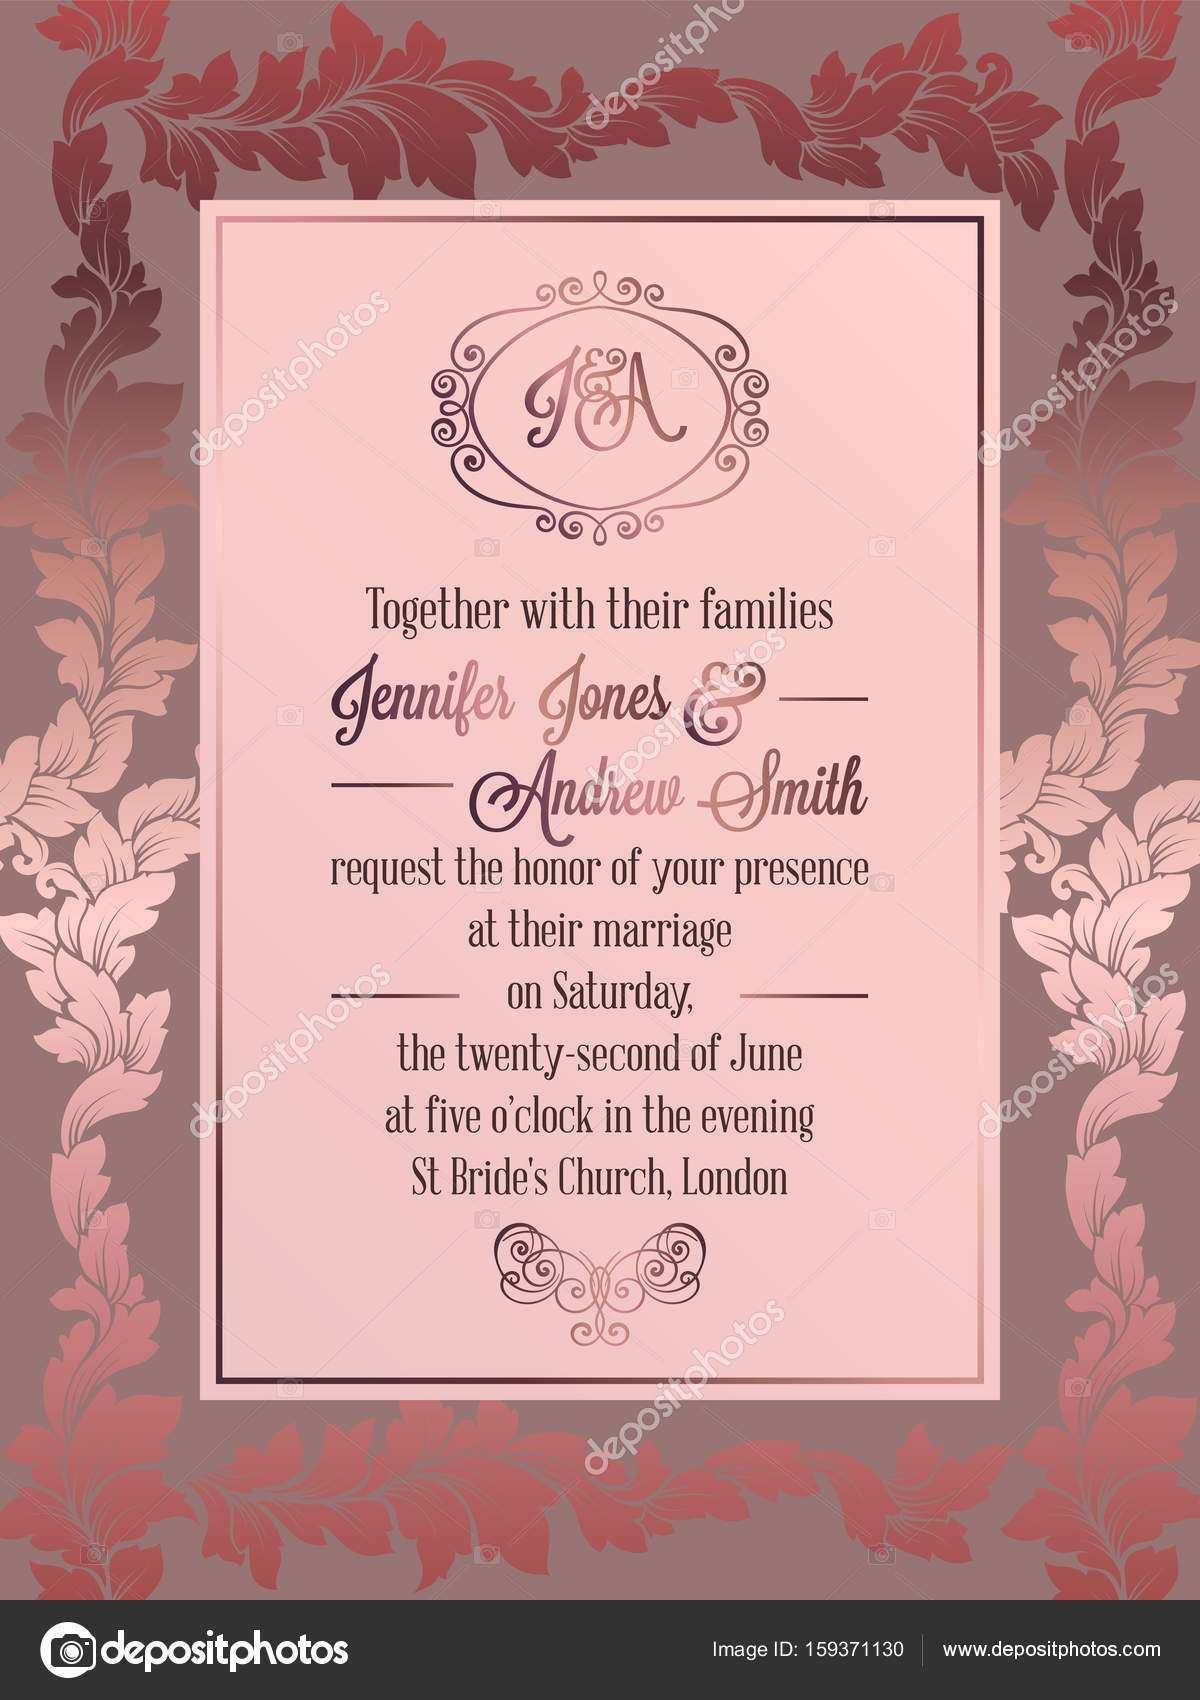 13 Creating Formal Invitation Background Designs Maker with Formal Invitation Background Designs